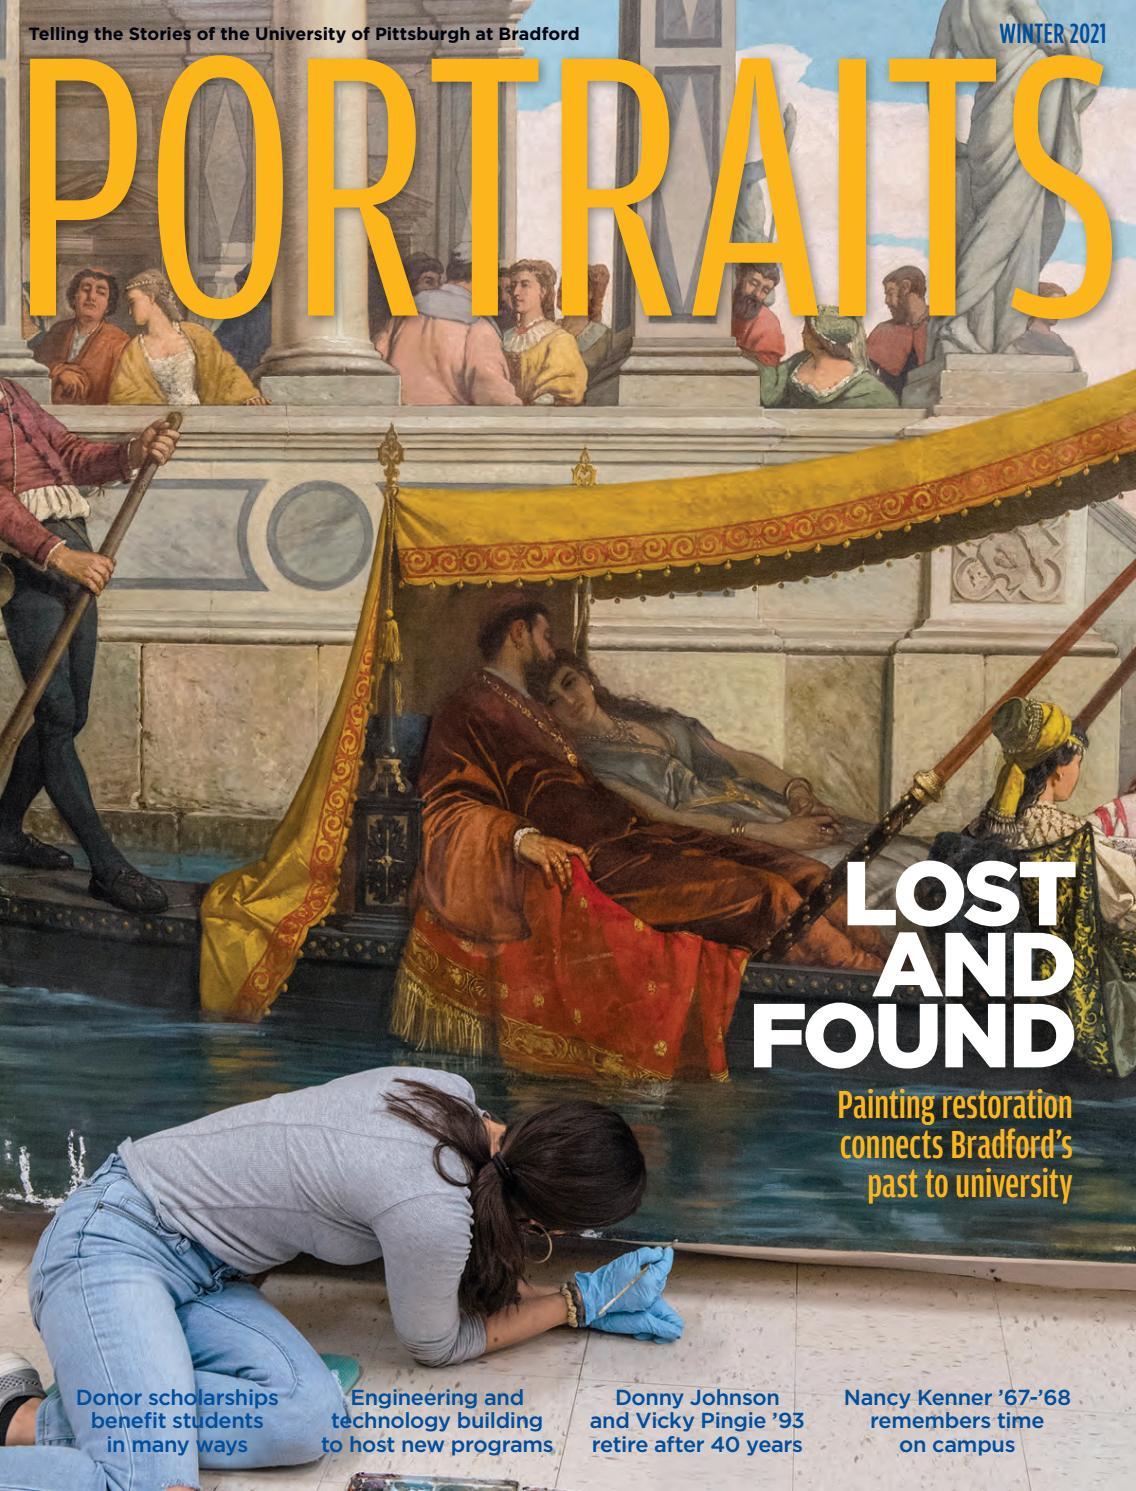 Pitt Academic Calendar 2022 23.Portraits Magazine Winter 2021 By Pitt Bradford Issuu